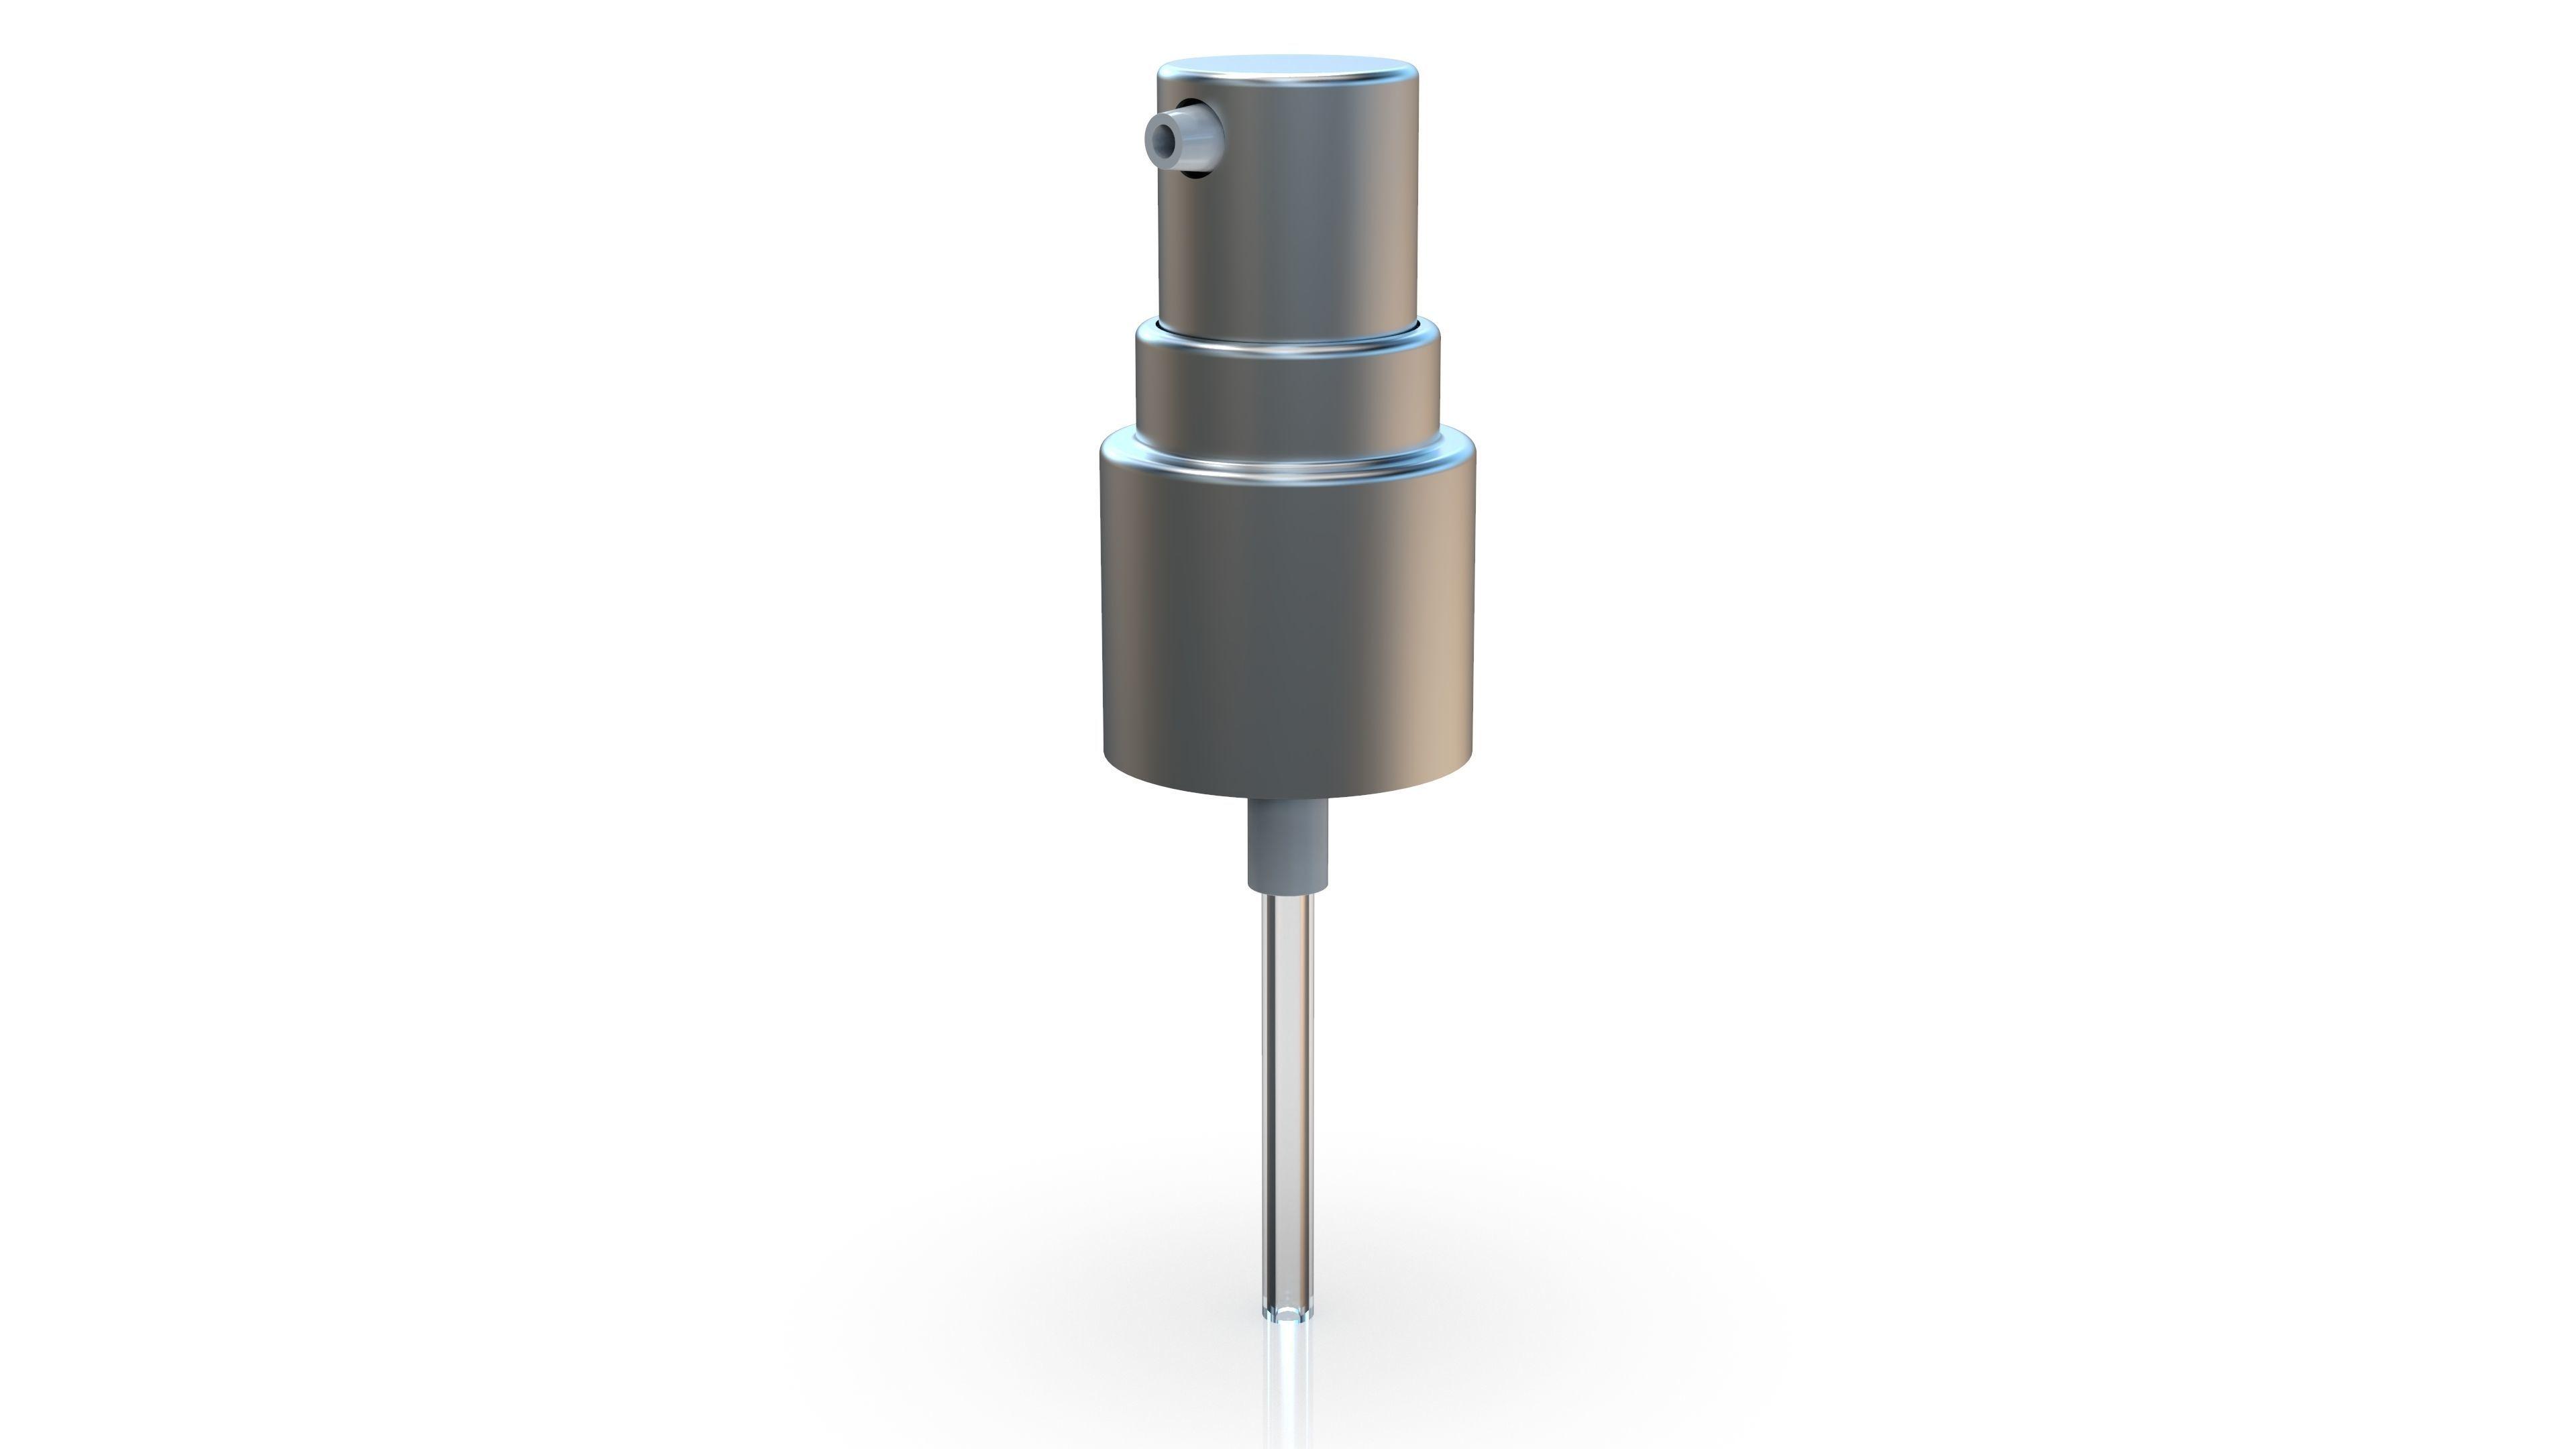 Cream pump - L pipe - 38 mm - Thread SP-410-20 - CR-65-2-00